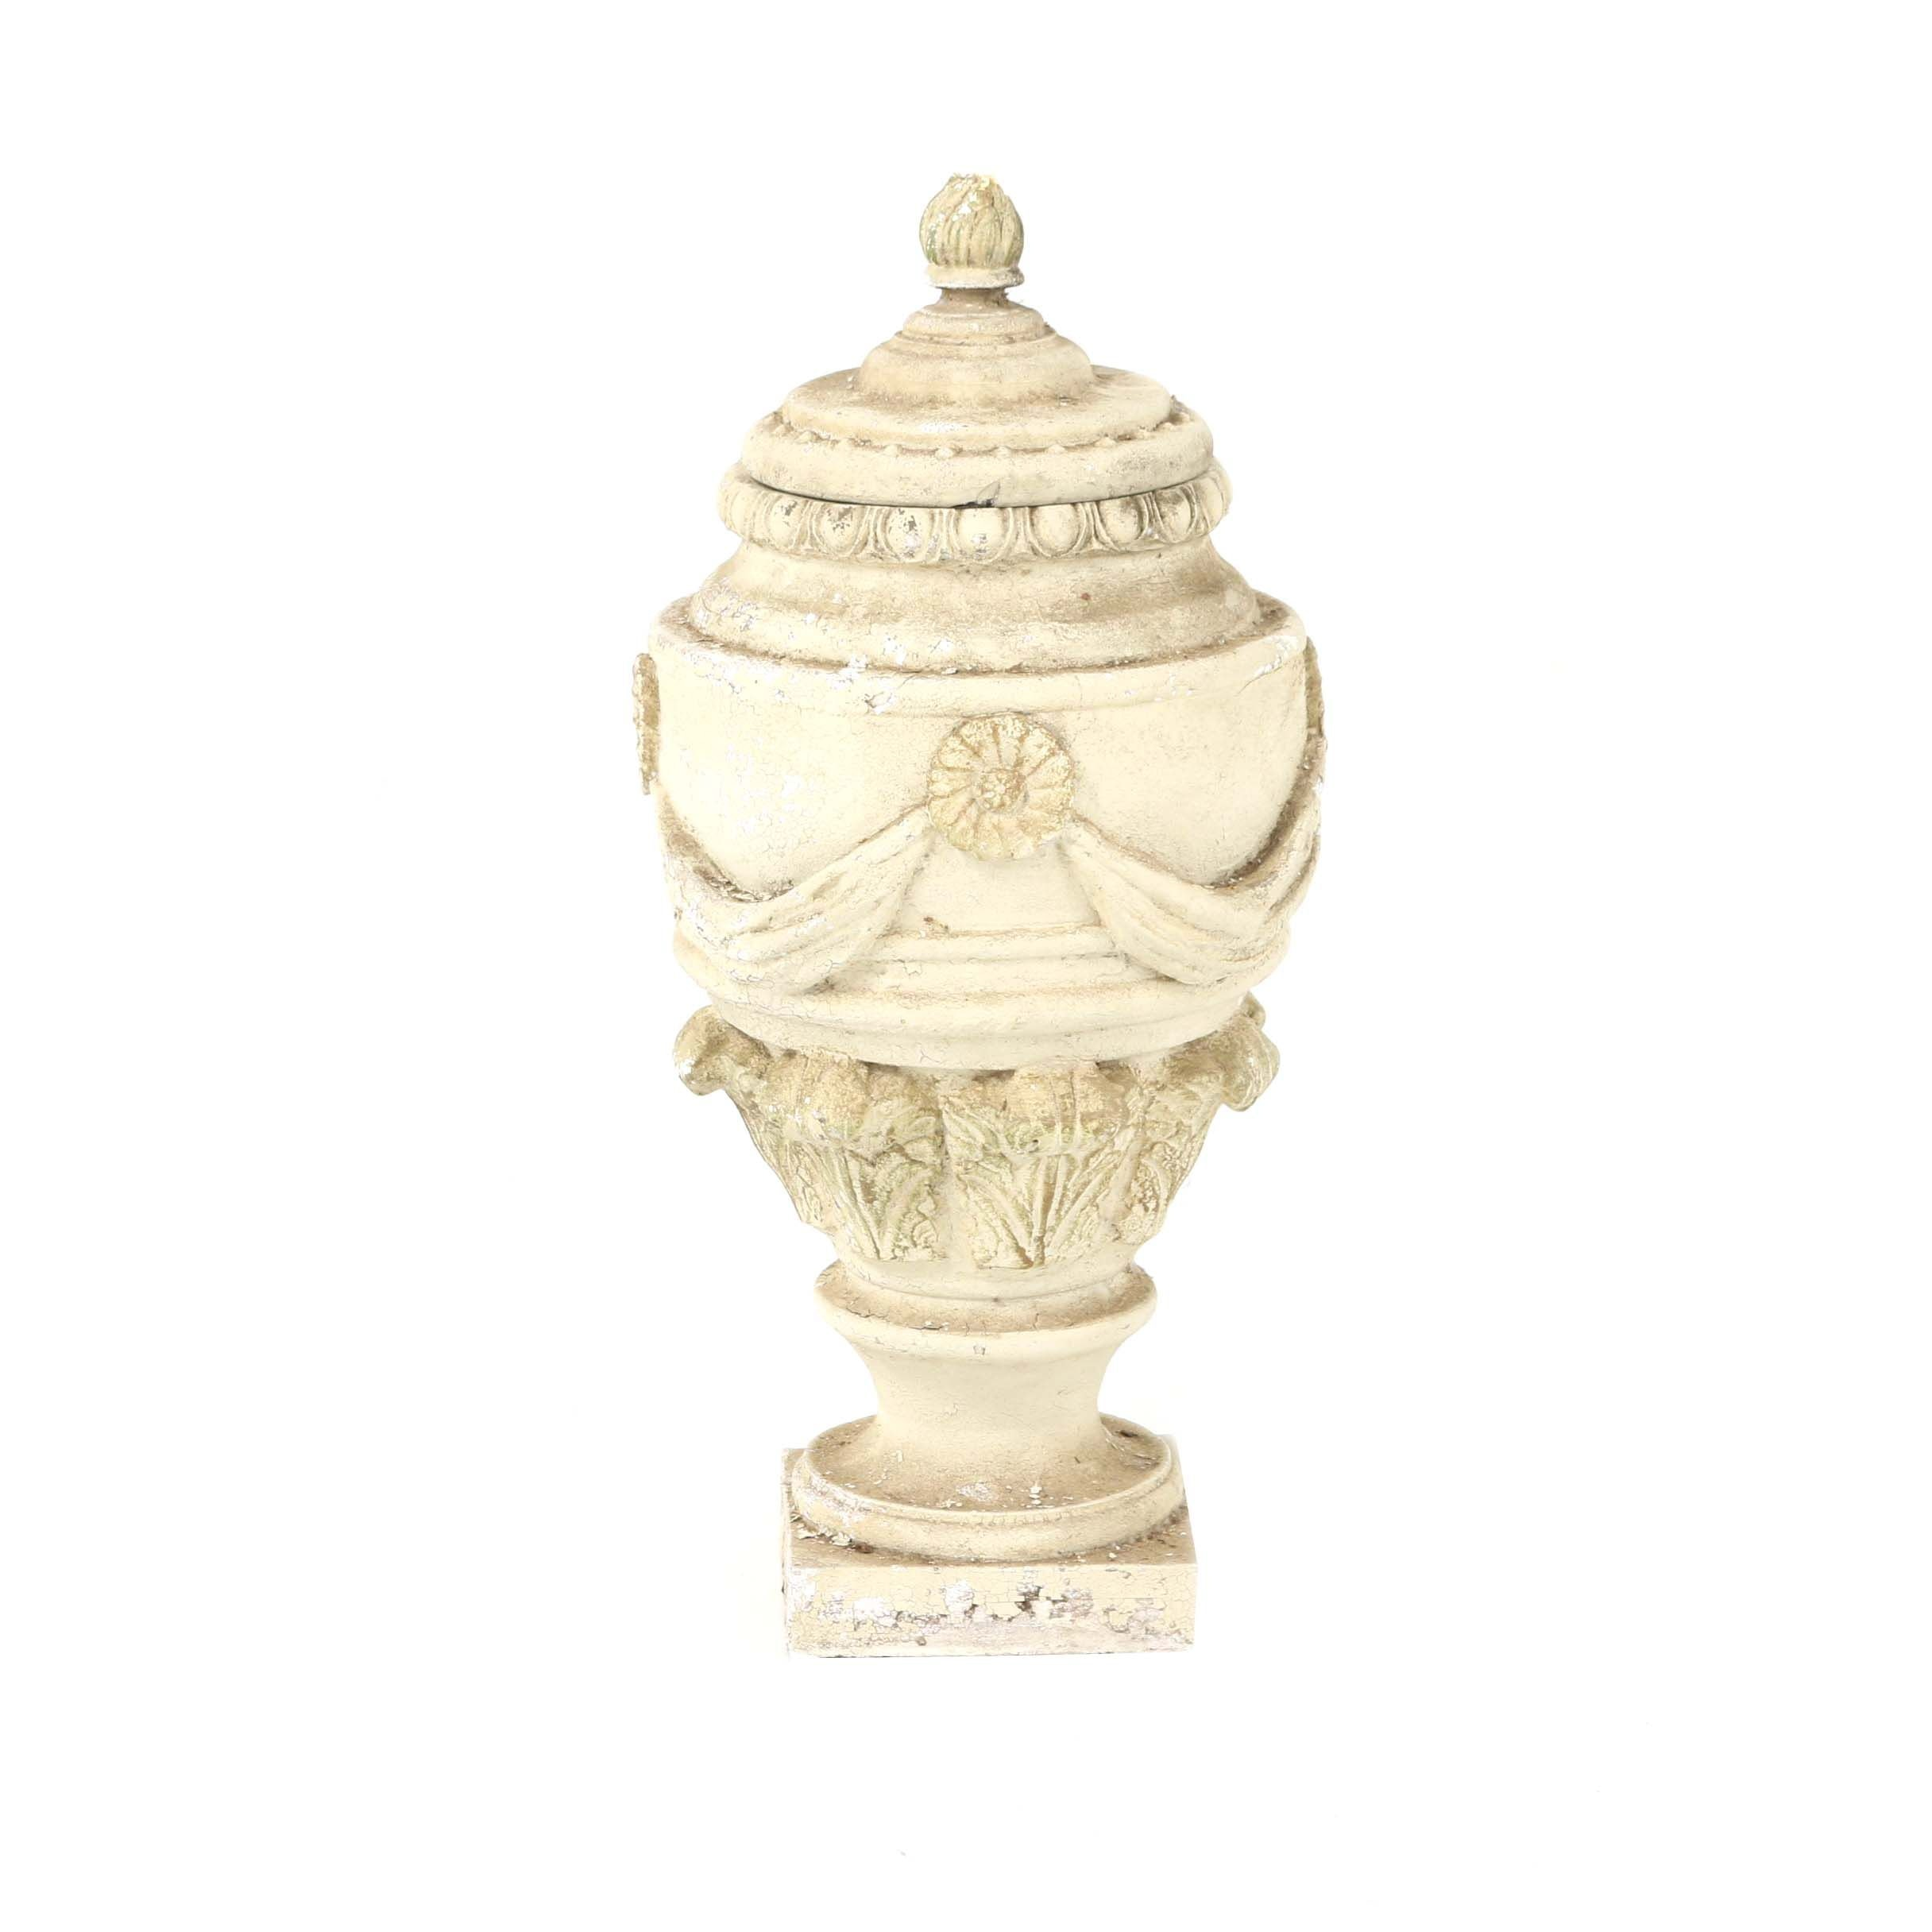 Cast Resin Neoclassical Style Garden Urn